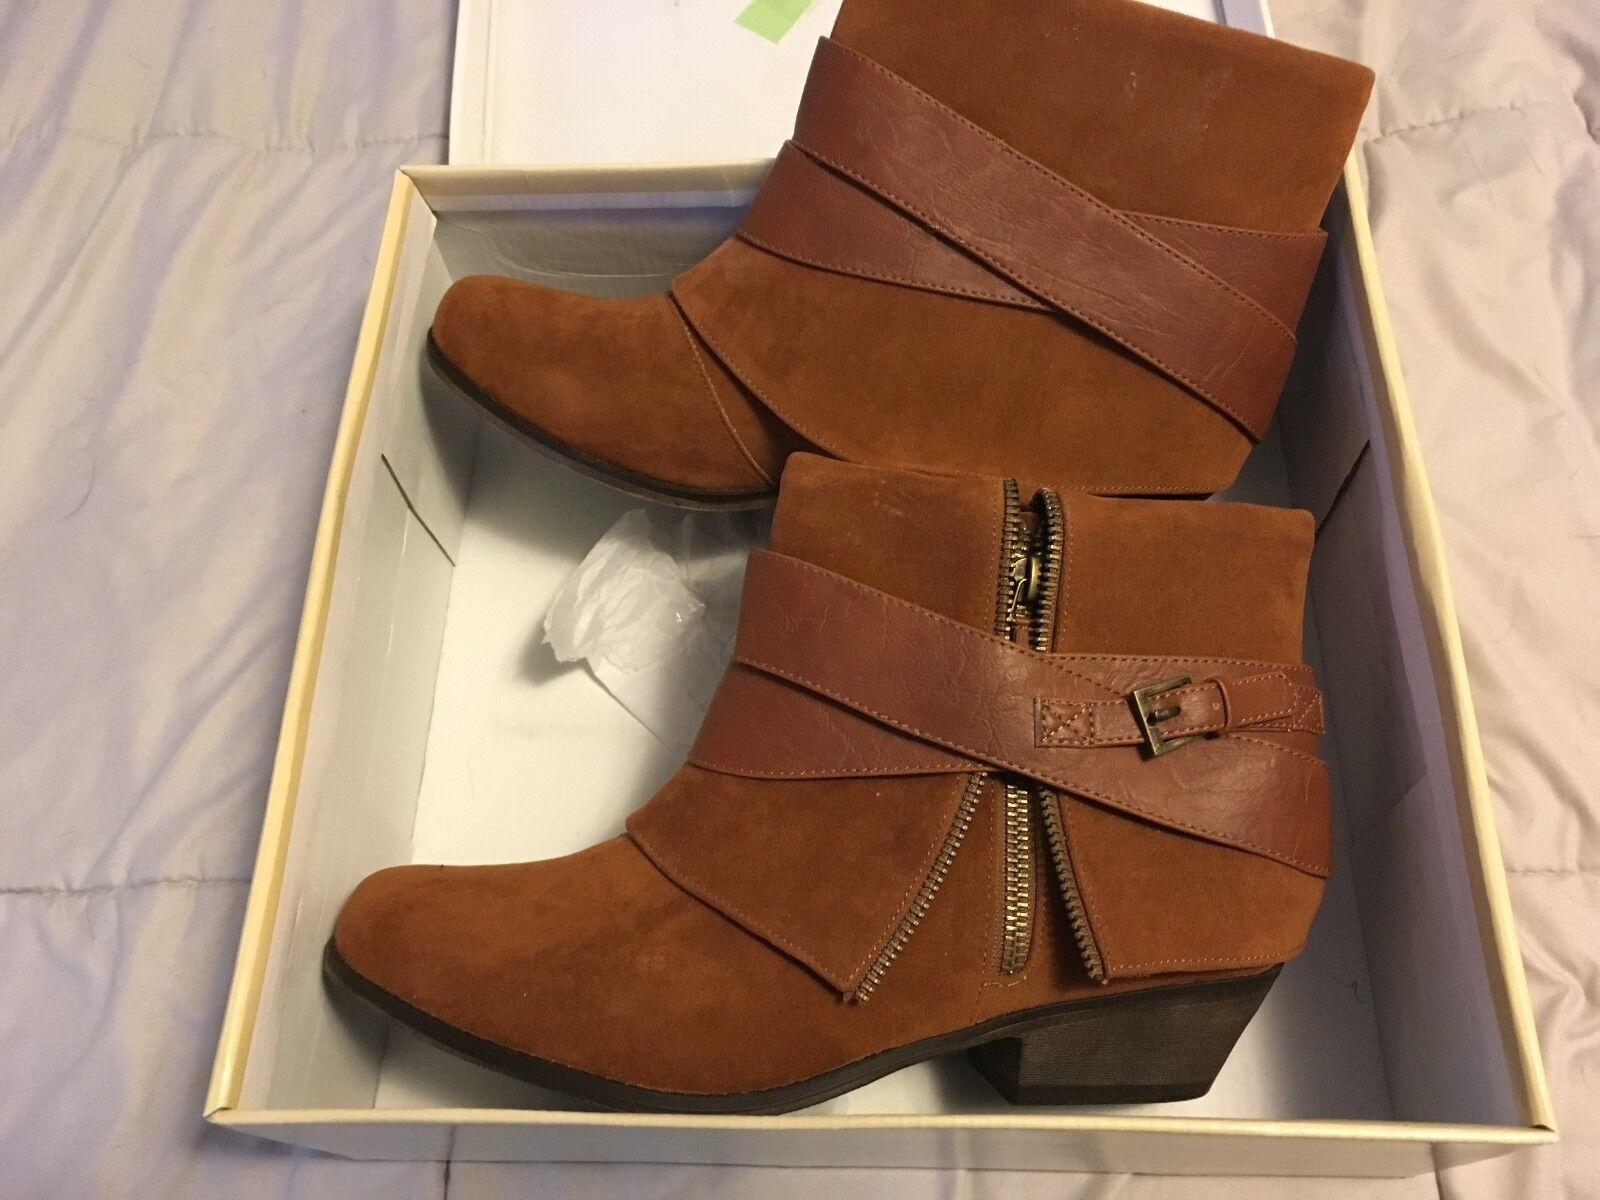 NEW NIB Fahrenheit DEBORAH-02 LOW Heel Booties Round Toe Women shoes CAMEL SZ 9